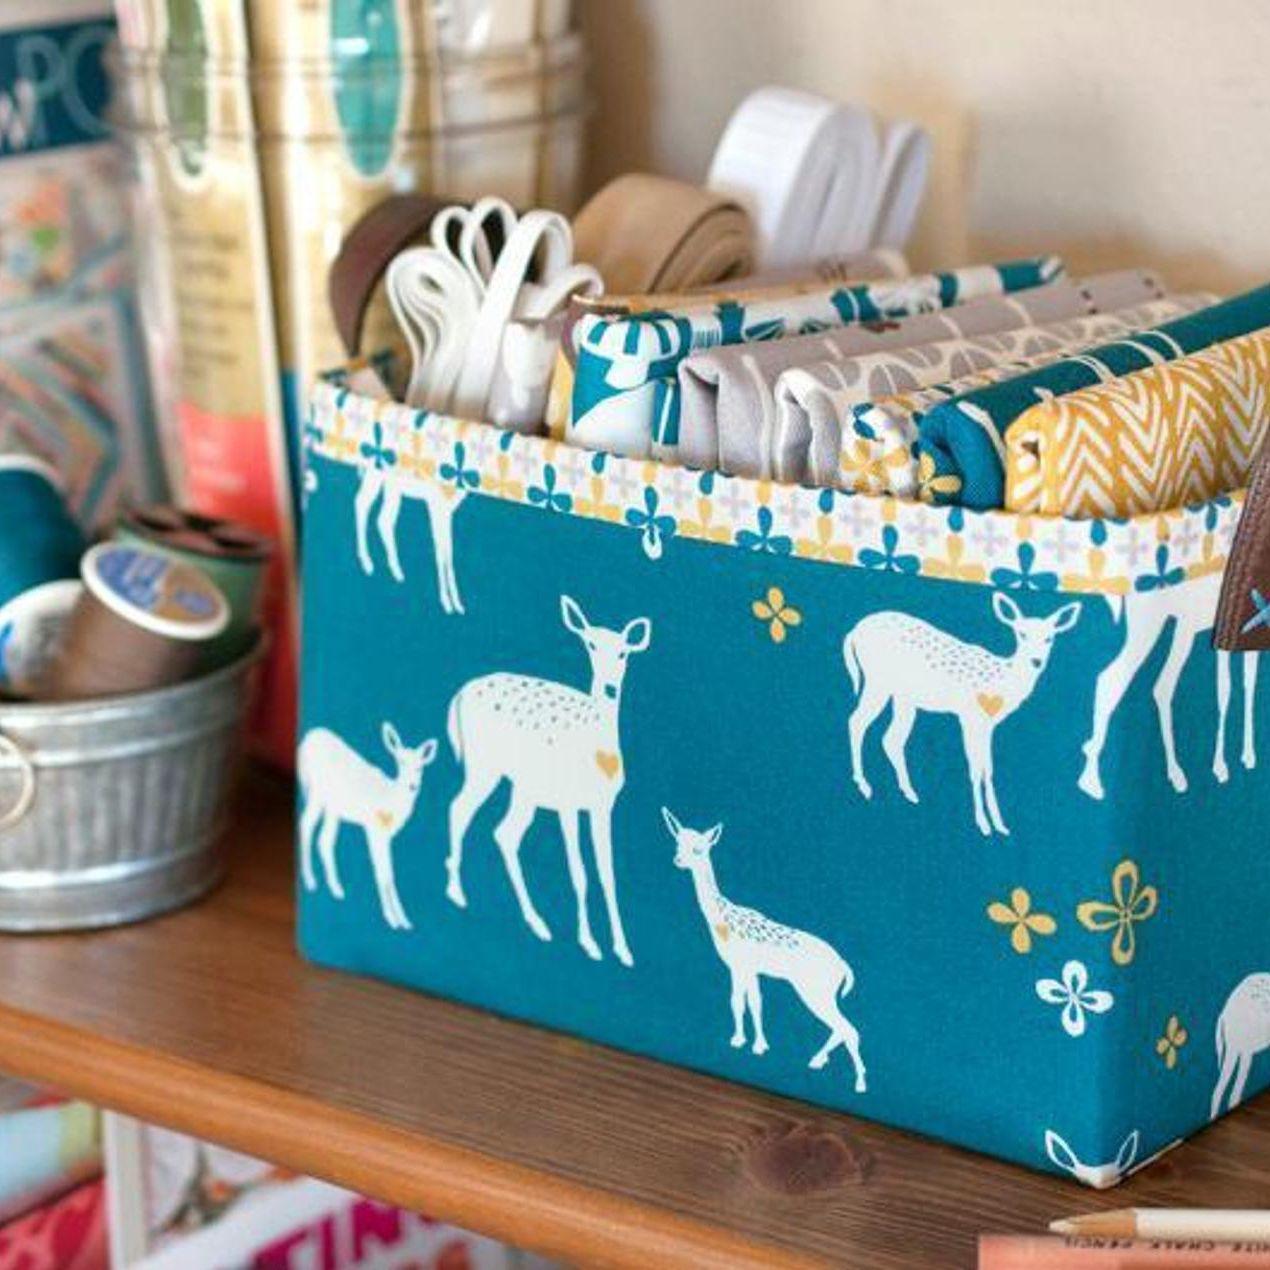 15 Creative Fabric Storage Ideas